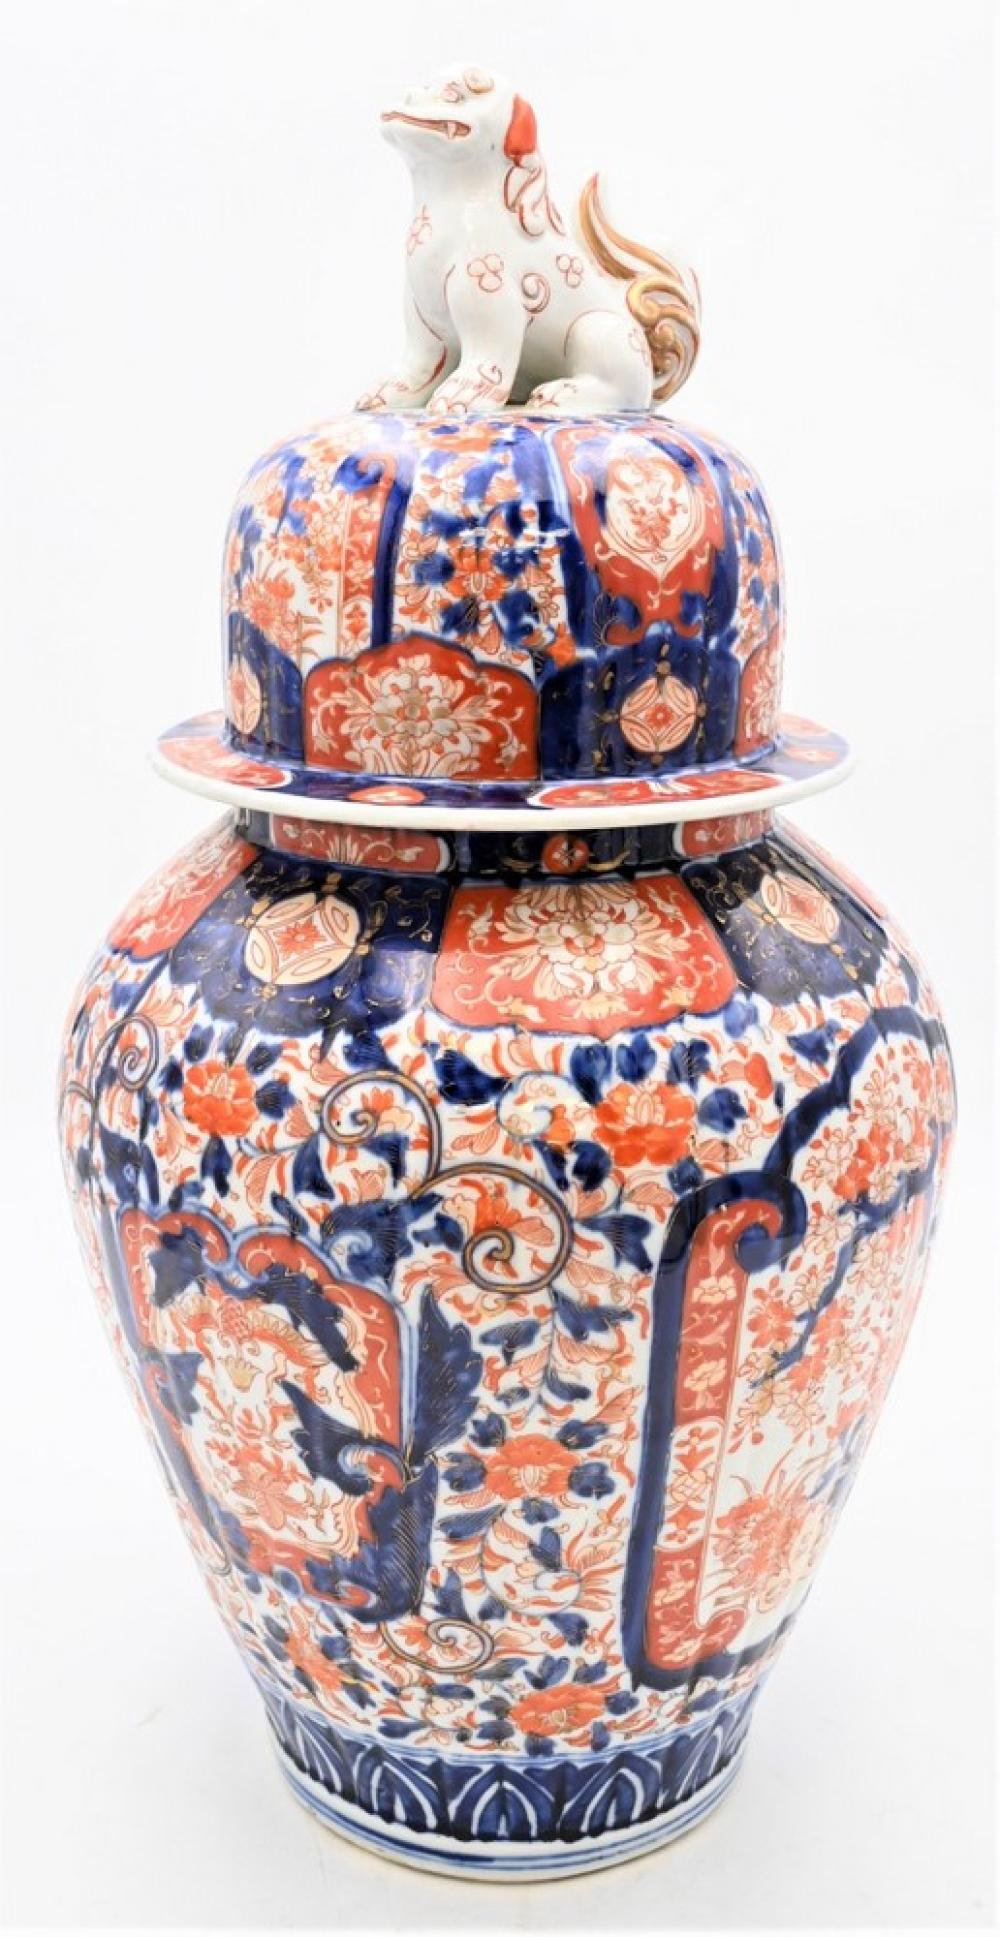 Large Japanese Imari Porcelain Jarhaving foo dog finial on dome shaped cover on baluster form vase, painted with garden scenesheig...